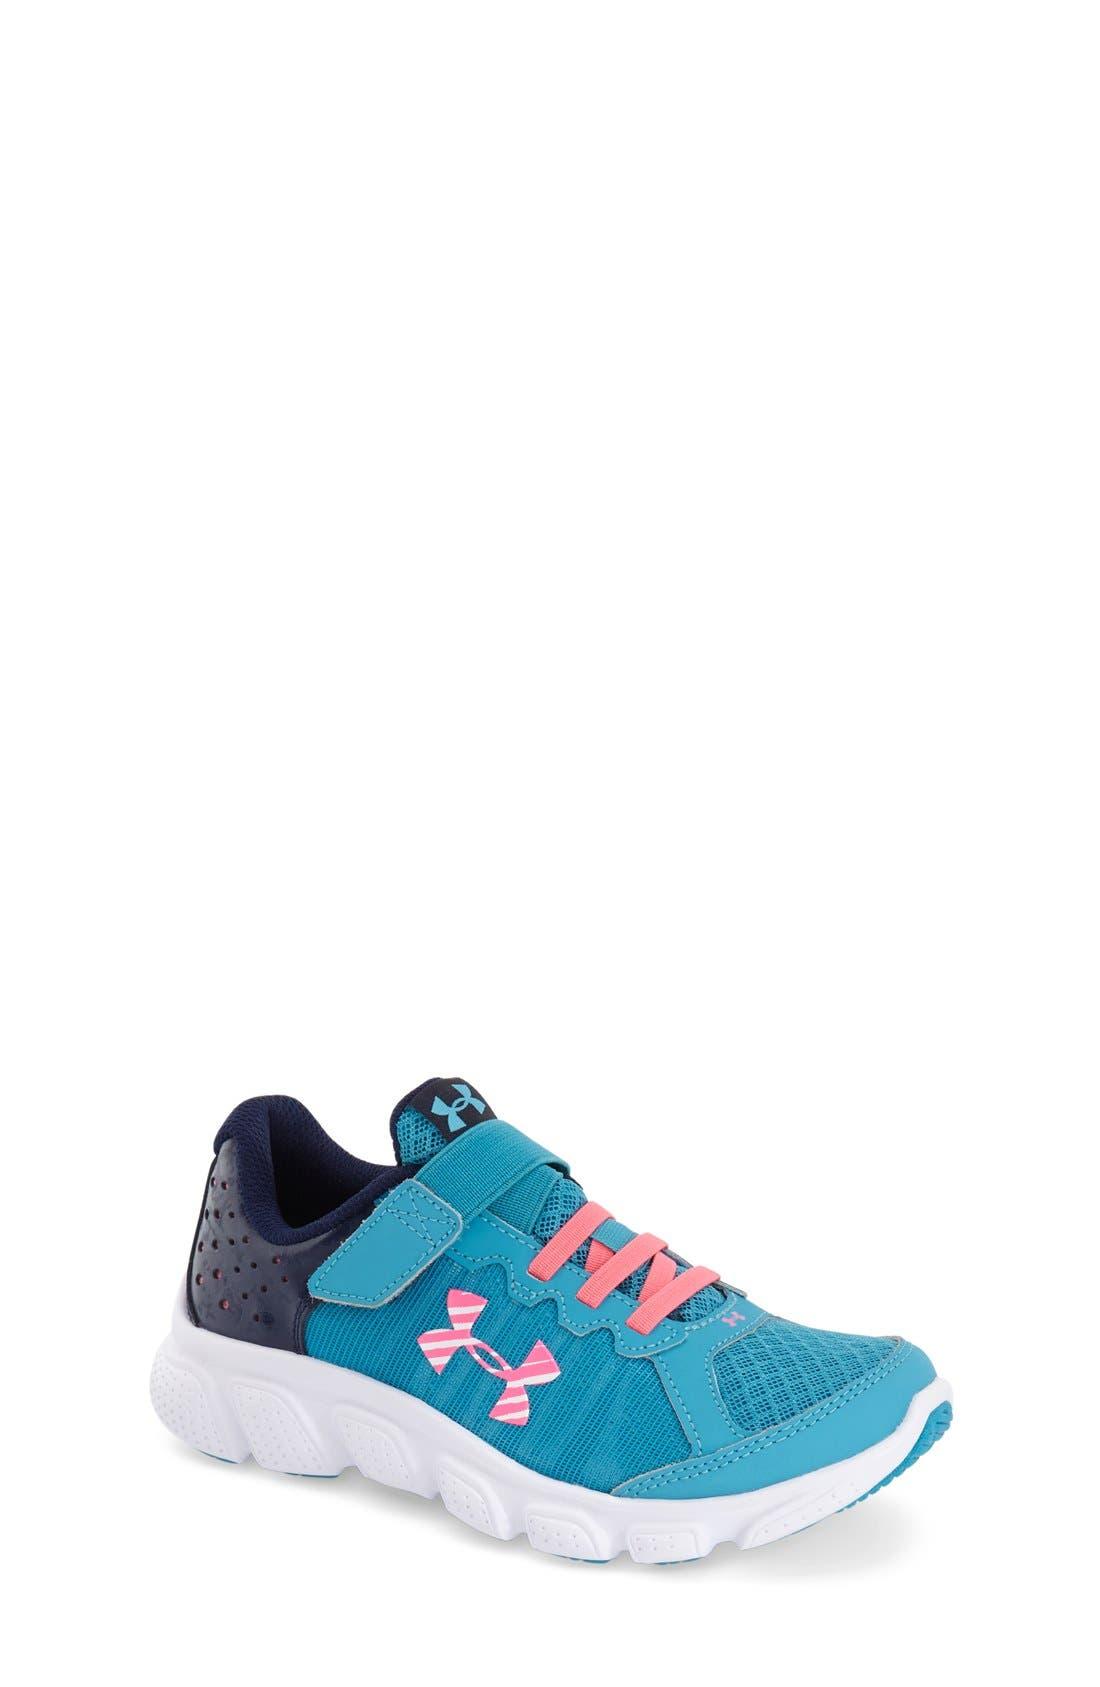 Micro G<sup>®</sup> Assert VI Running Shoe,                             Main thumbnail 1, color,                             400